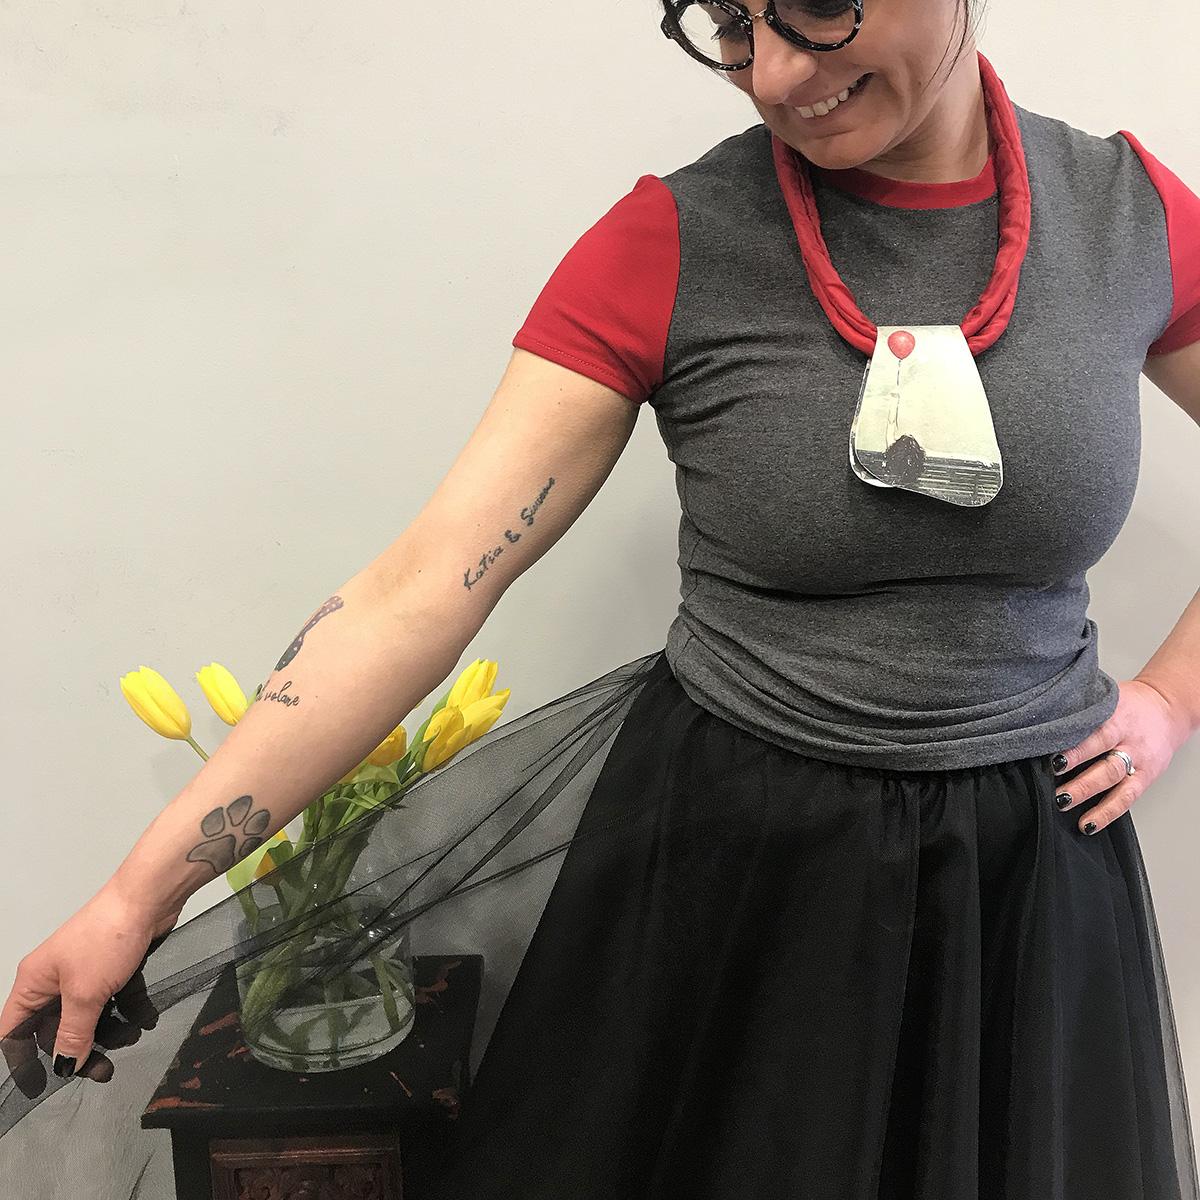 t-shirt-crazy-art-torino-sartoria-italiana-handmade